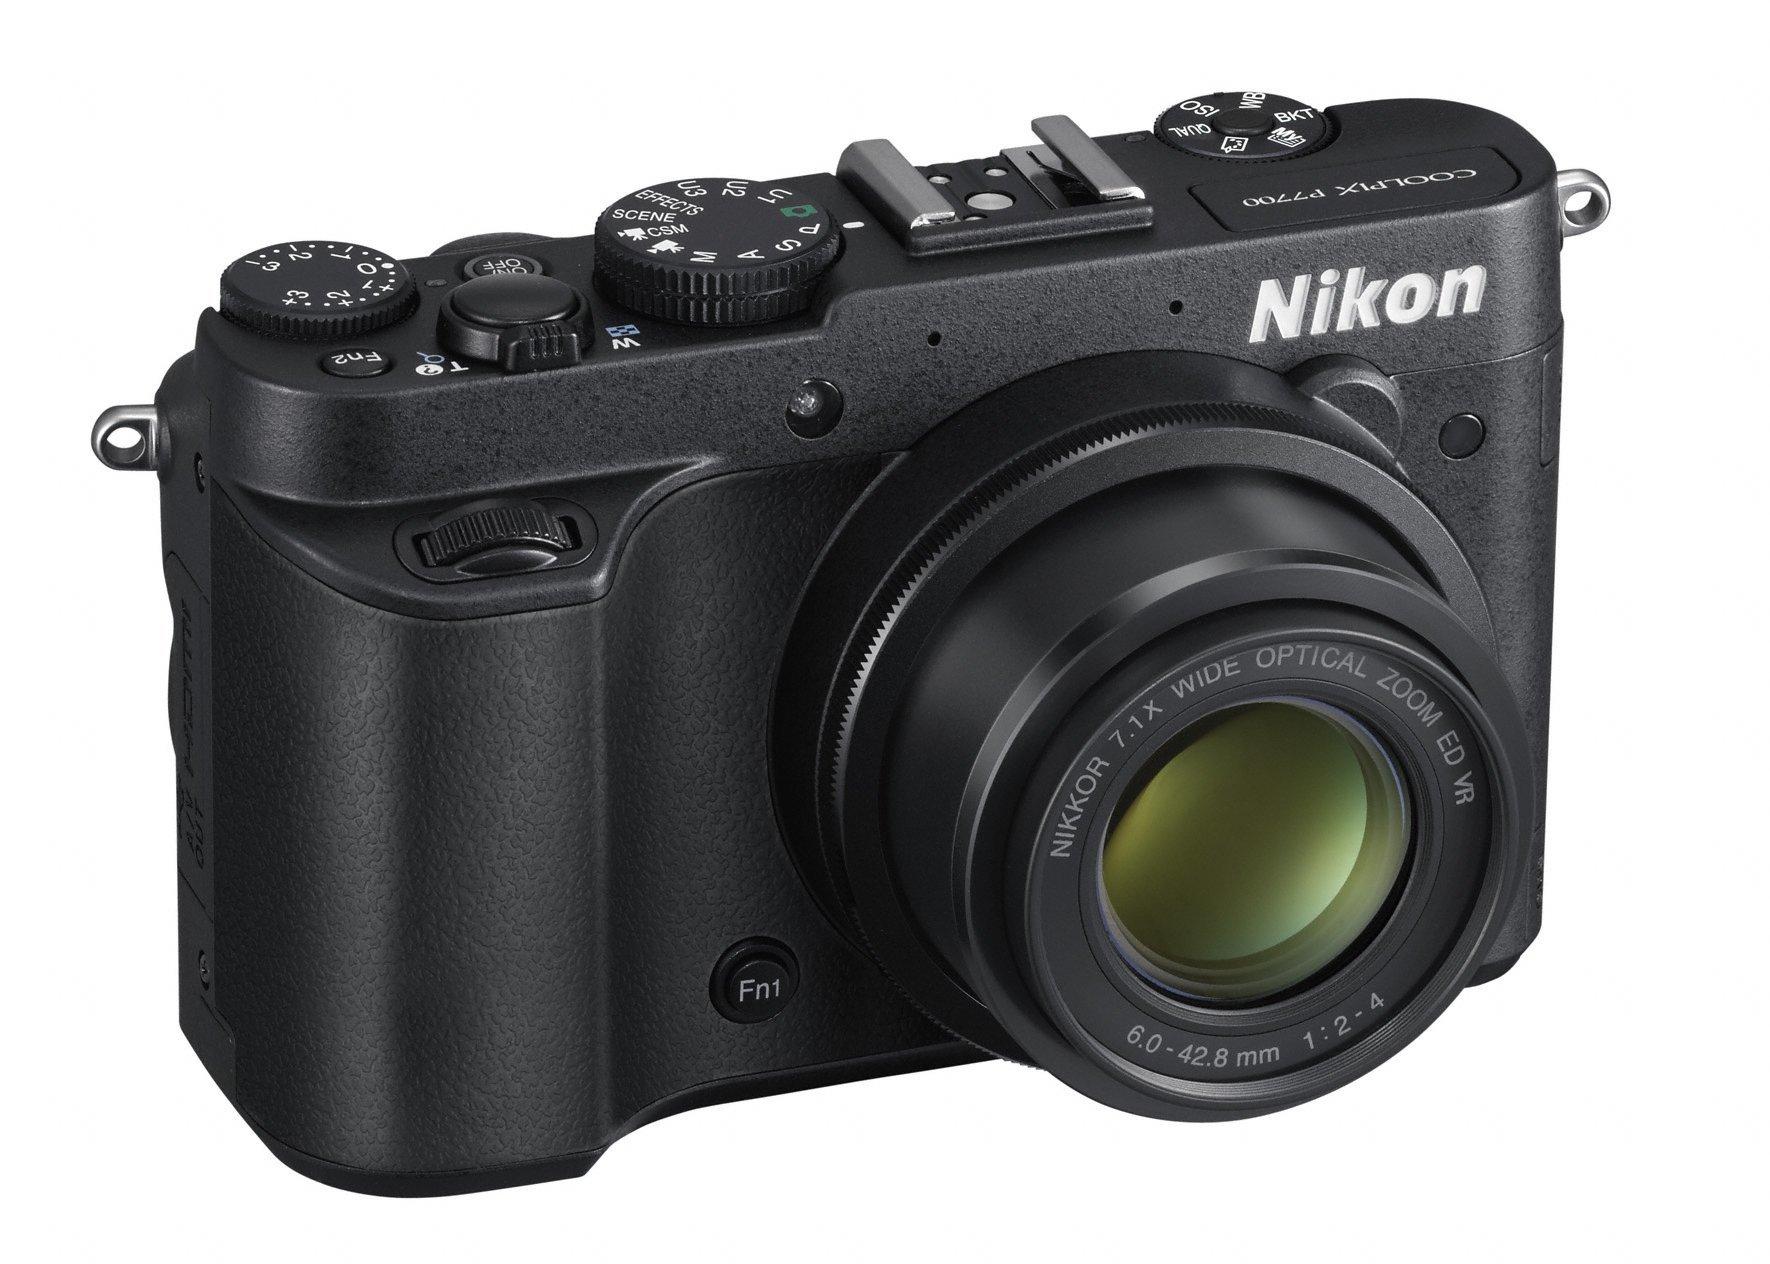 Kompaktni Nikon za perfekcioniste